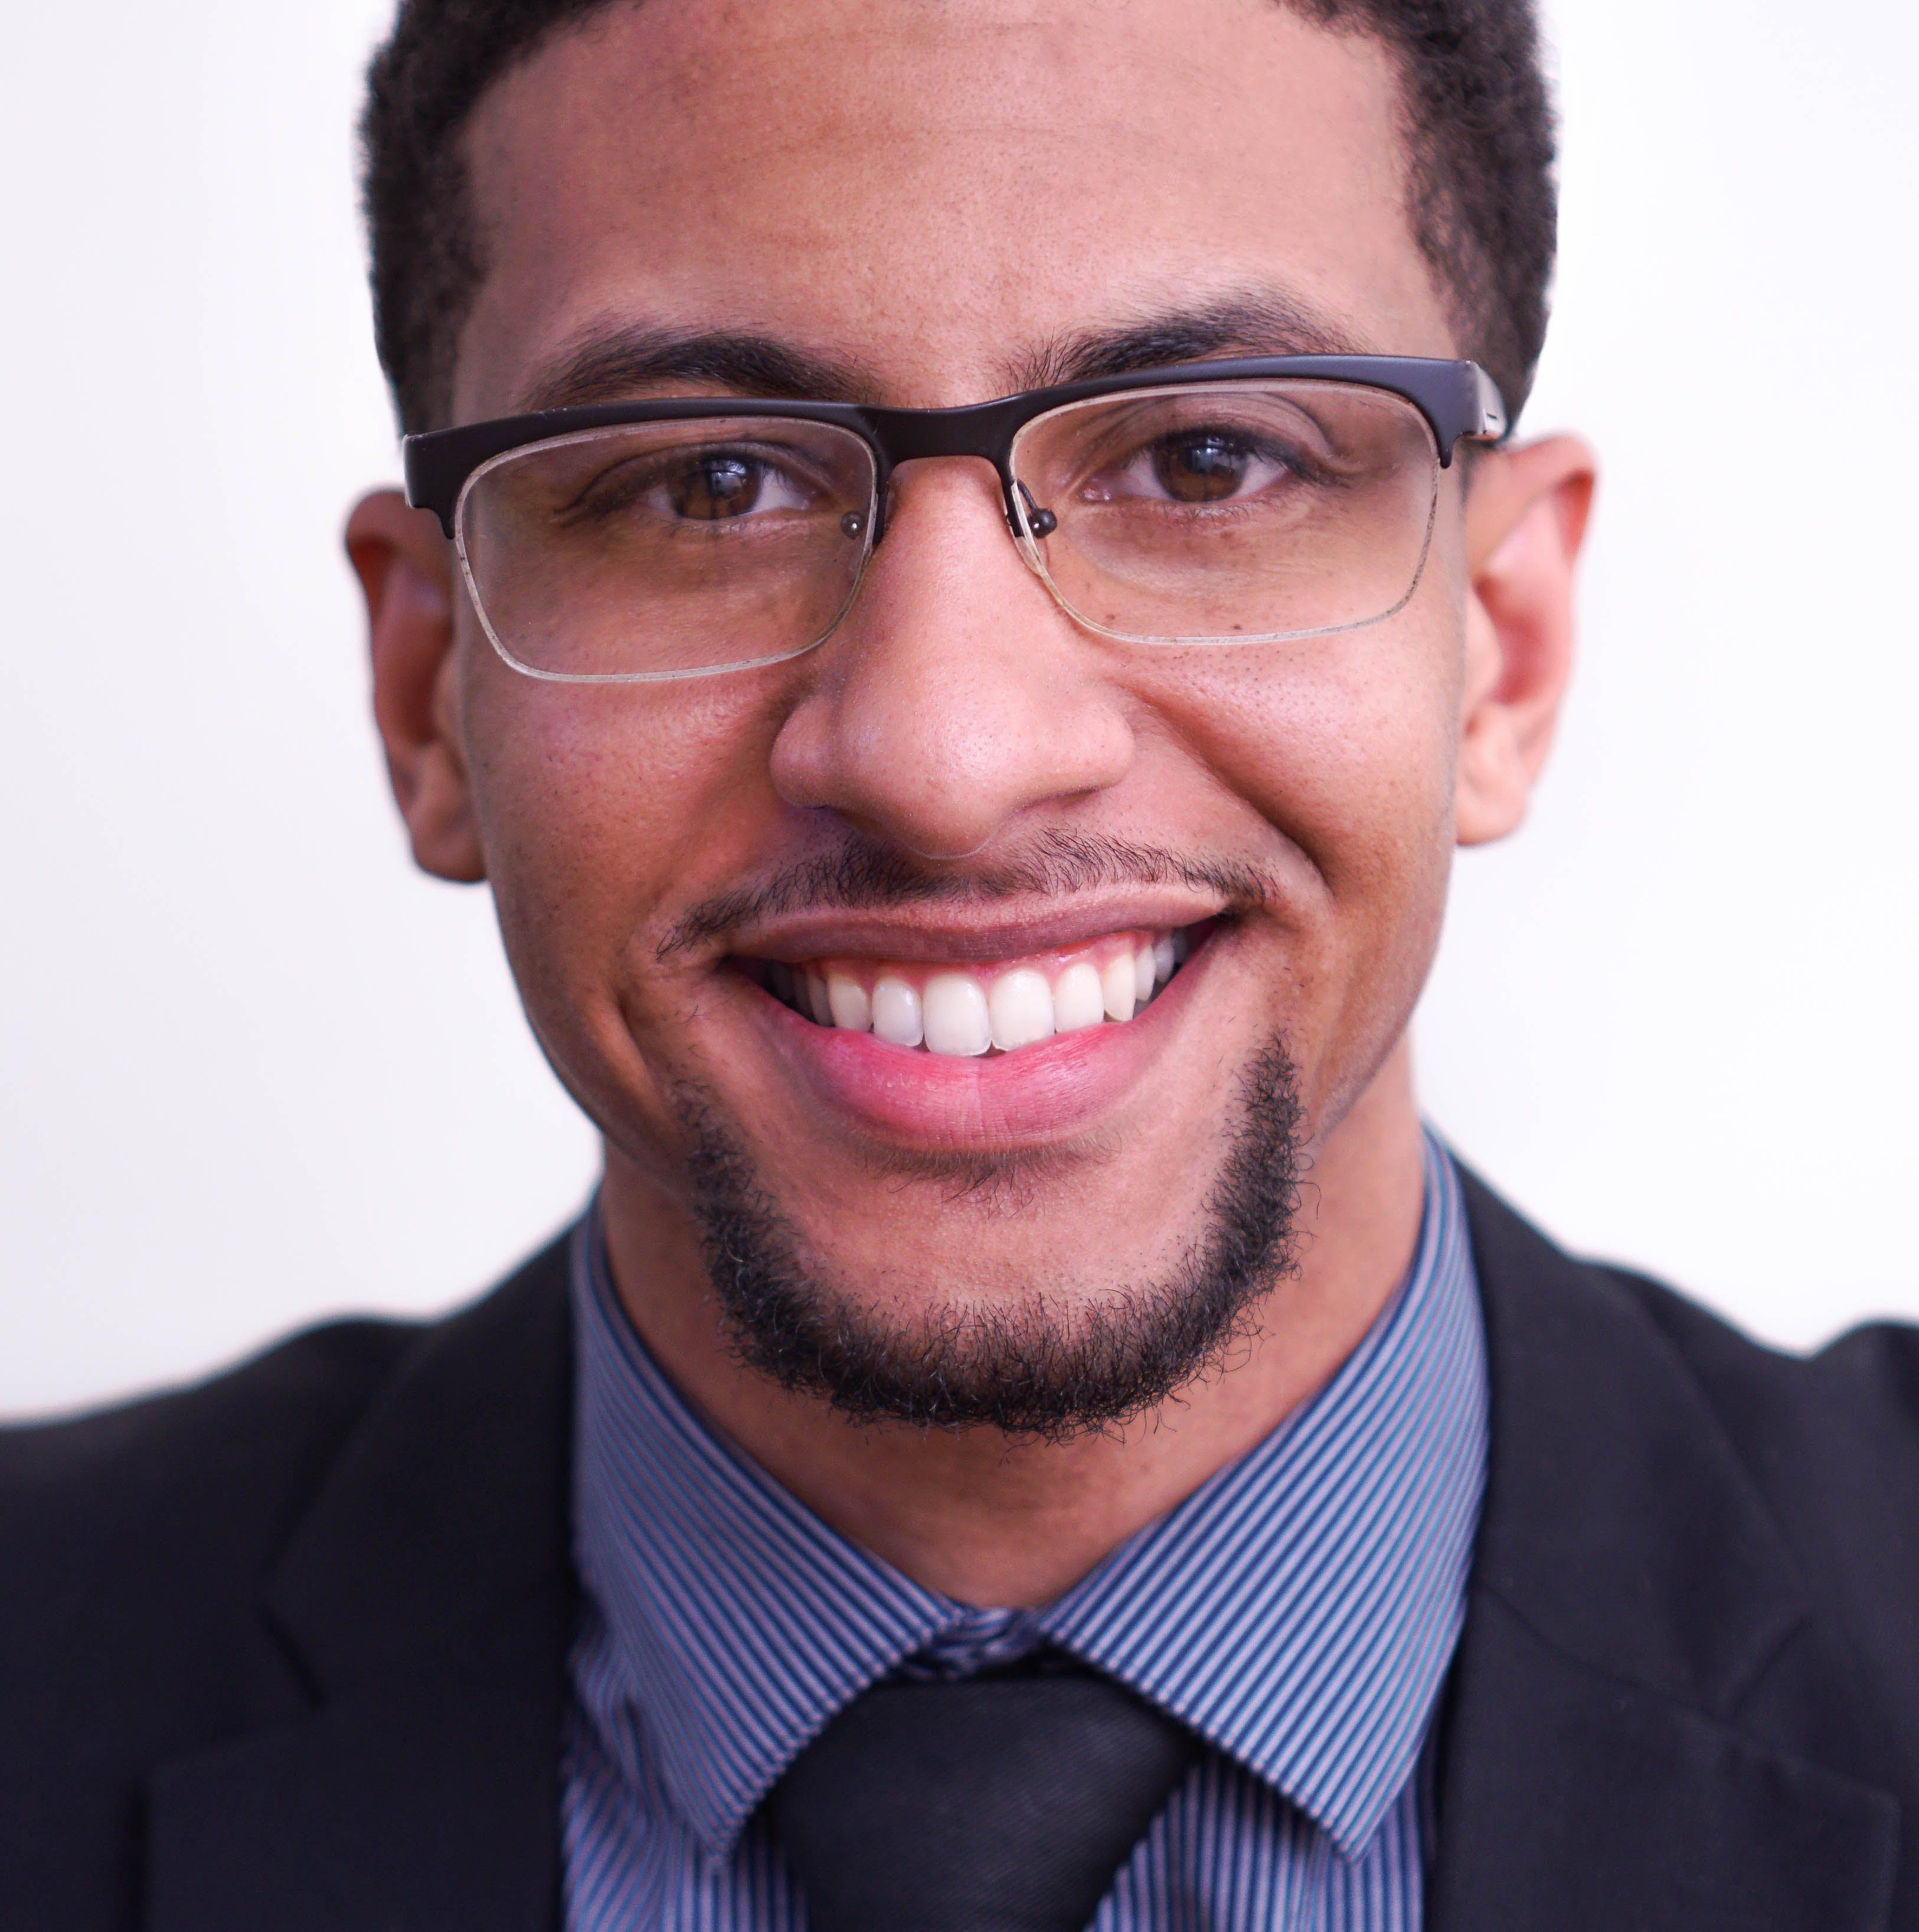 Free stock photo of black man, eye glasses, man wearing glasses, necktie